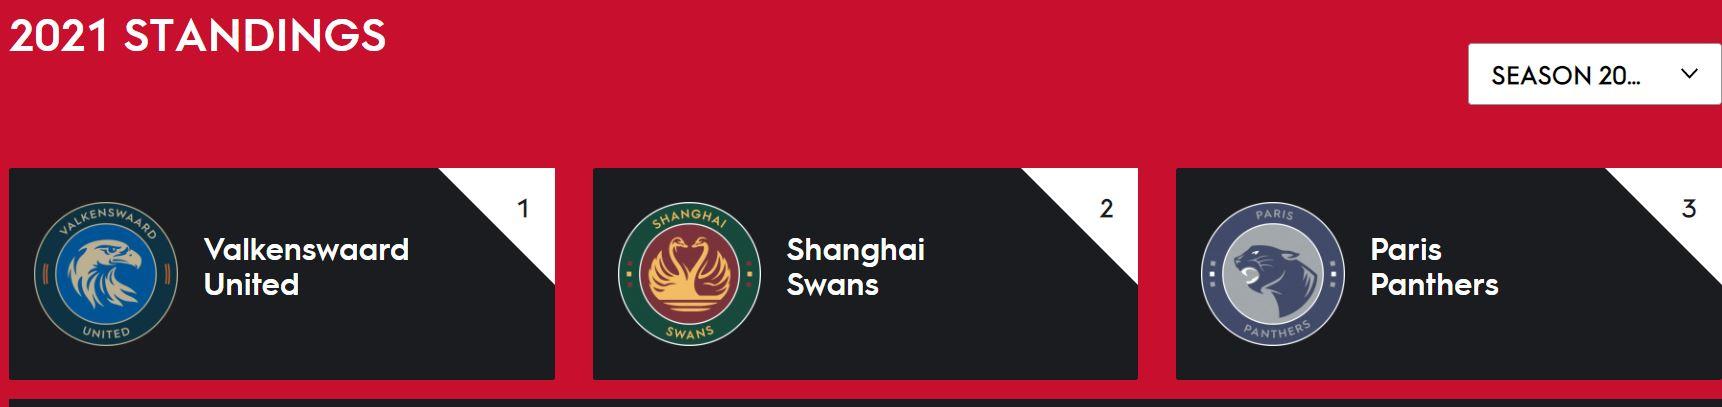 La GCL del Global di Roma agli Shanghai Swans(Ahlmann + Baryard-Johnsson)